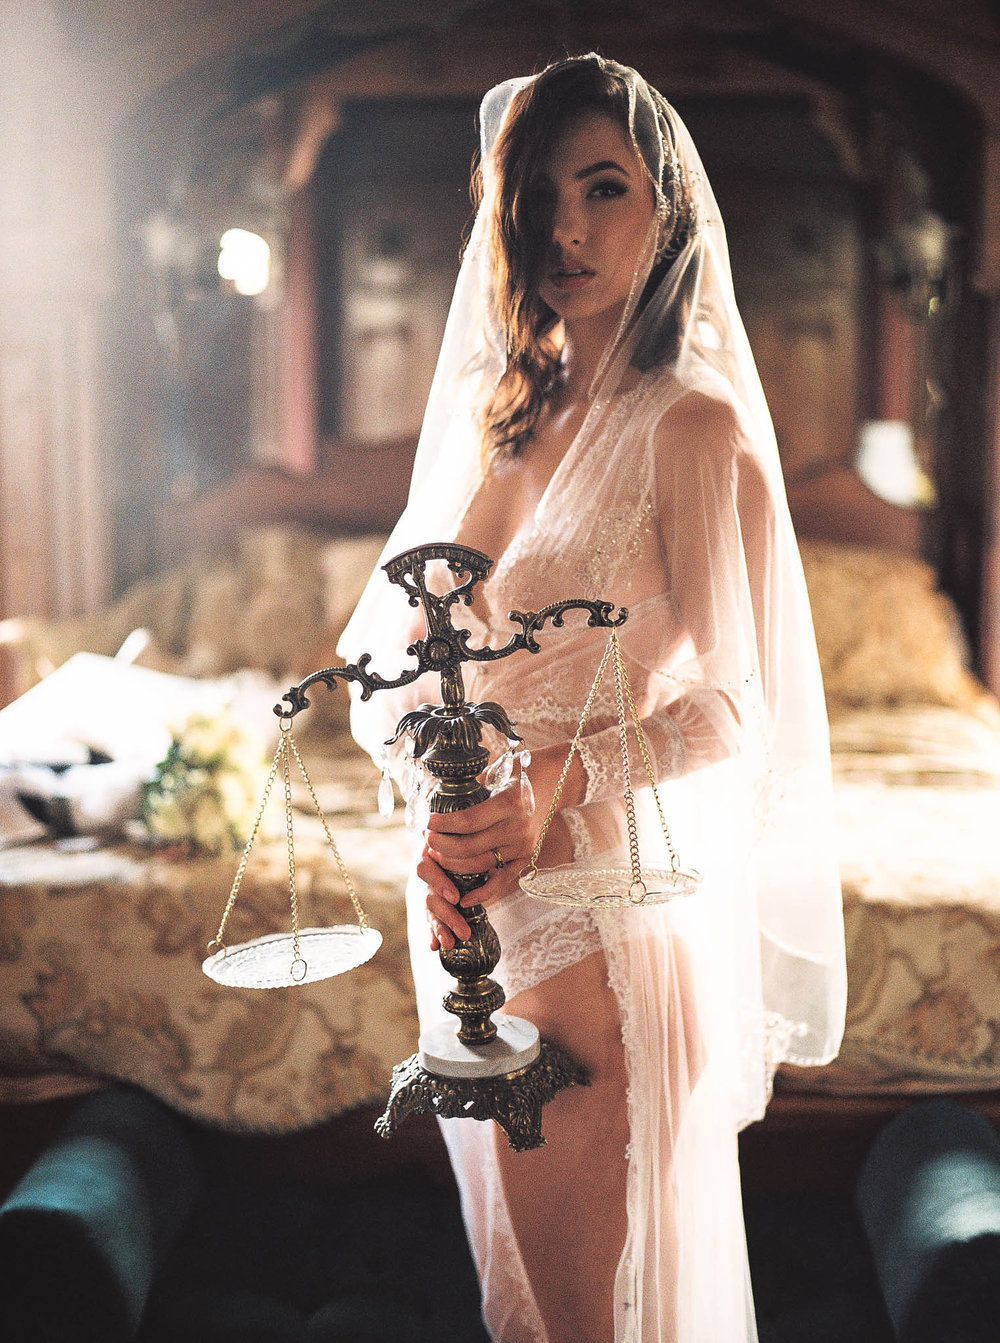 old-world-castle-wedding-inspiration-bridal-lara-lam-154.jpg